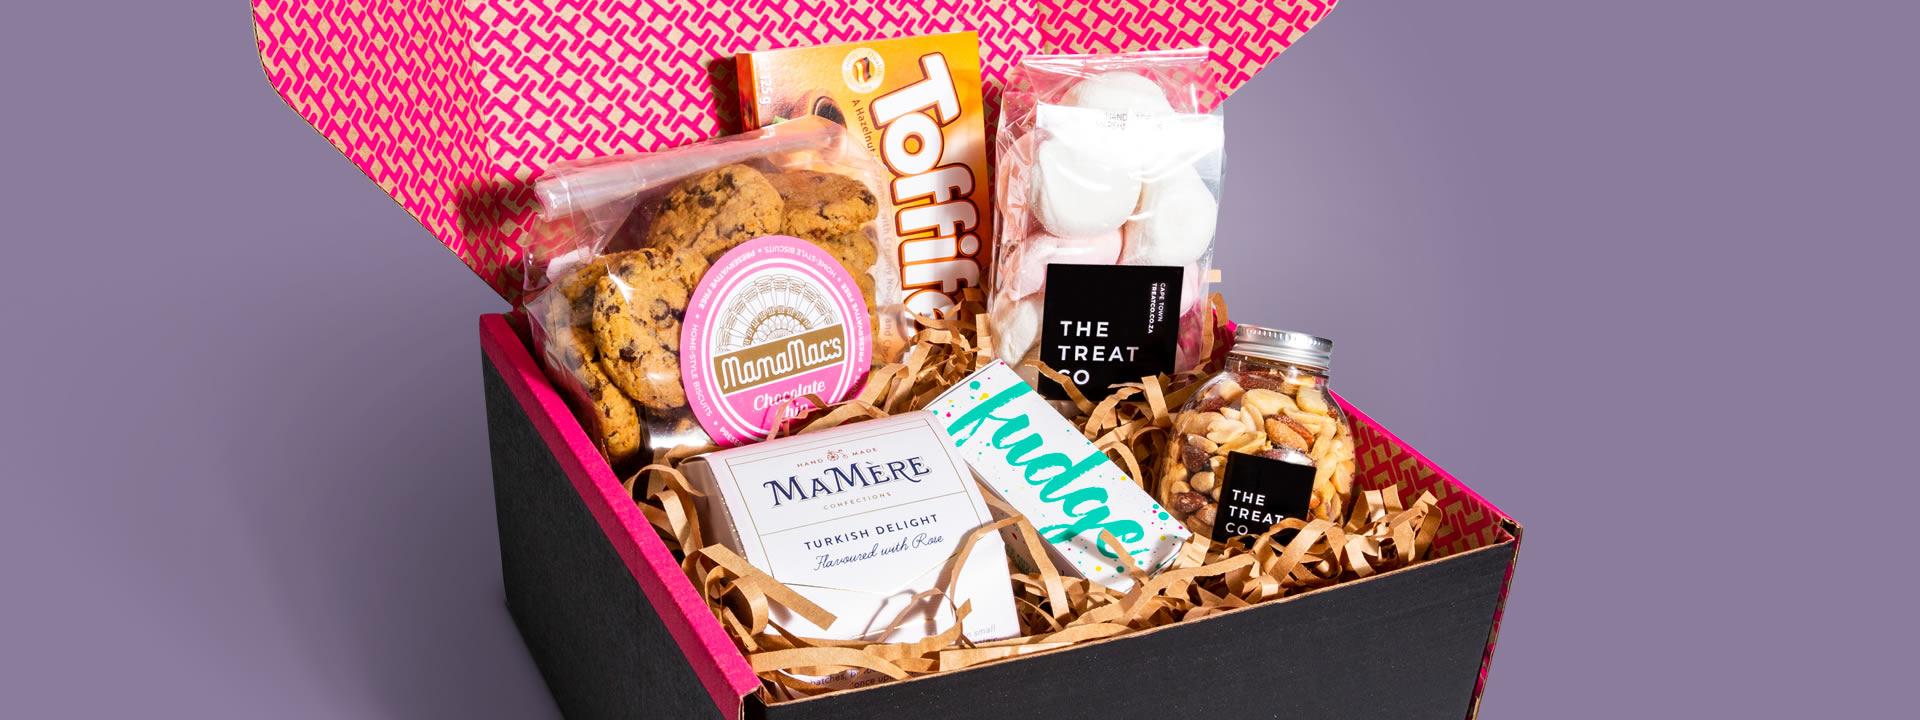 Buy Yuppiechef Brand Food Drink Gift Boxes